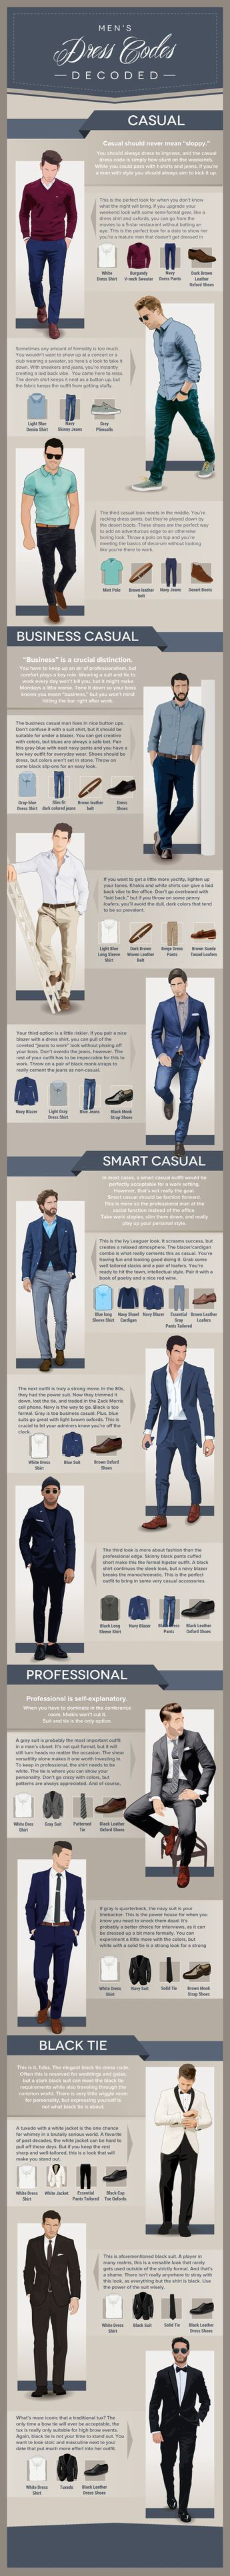 Men's Dress Codes Infographic Mens fashion Infographic